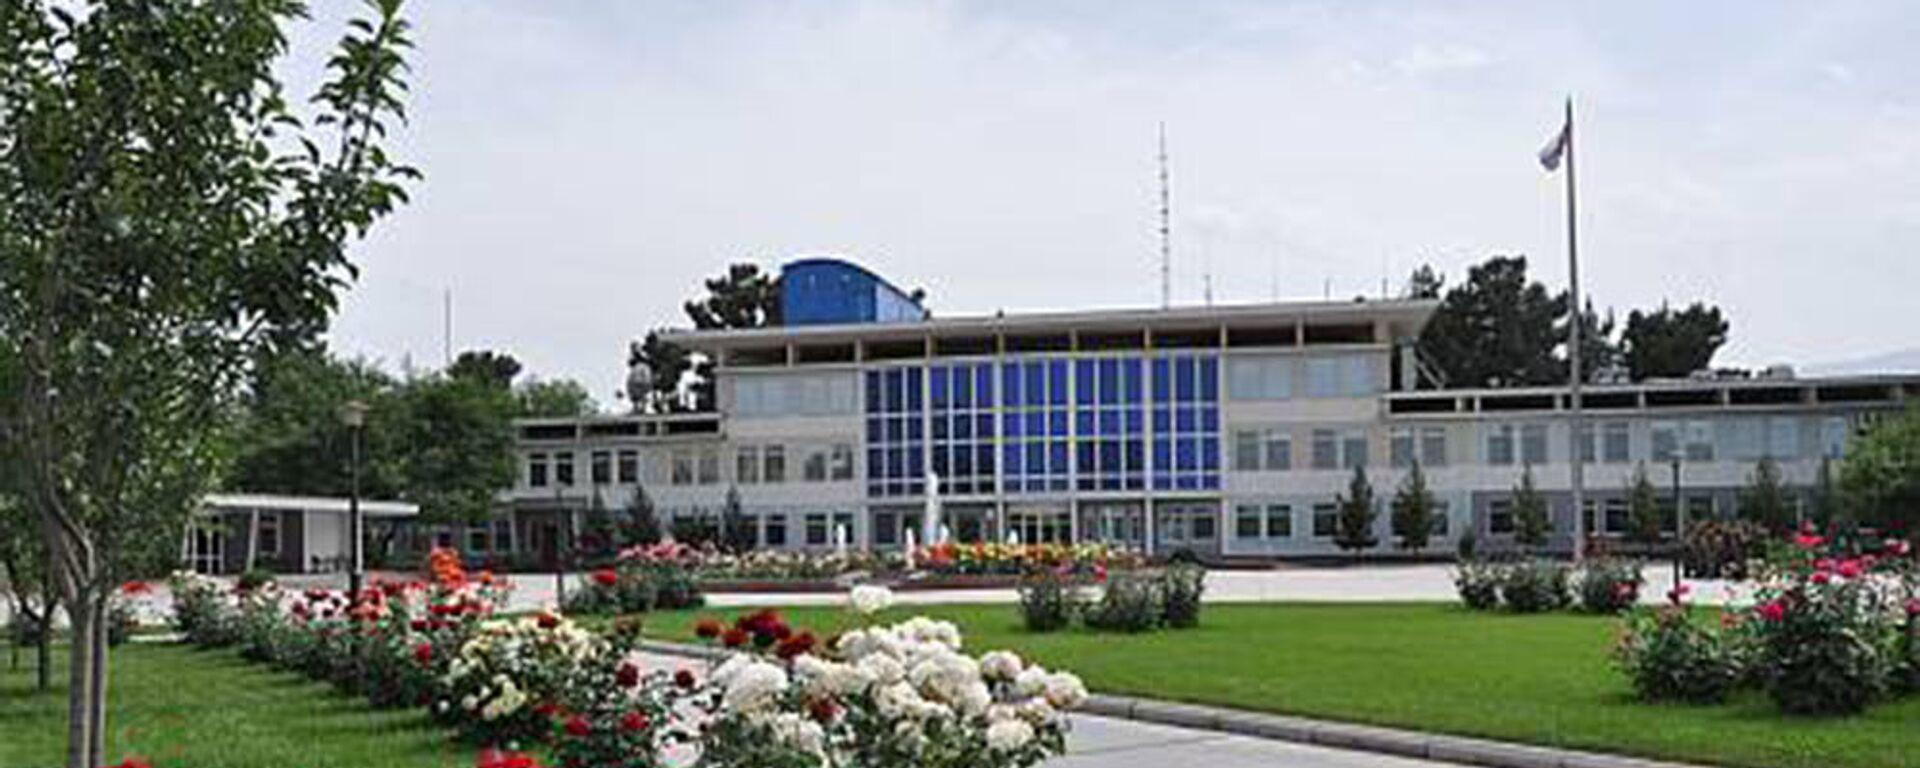 Ambasada Rosji w Kabulu - Sputnik Polska, 1920, 16.08.2021